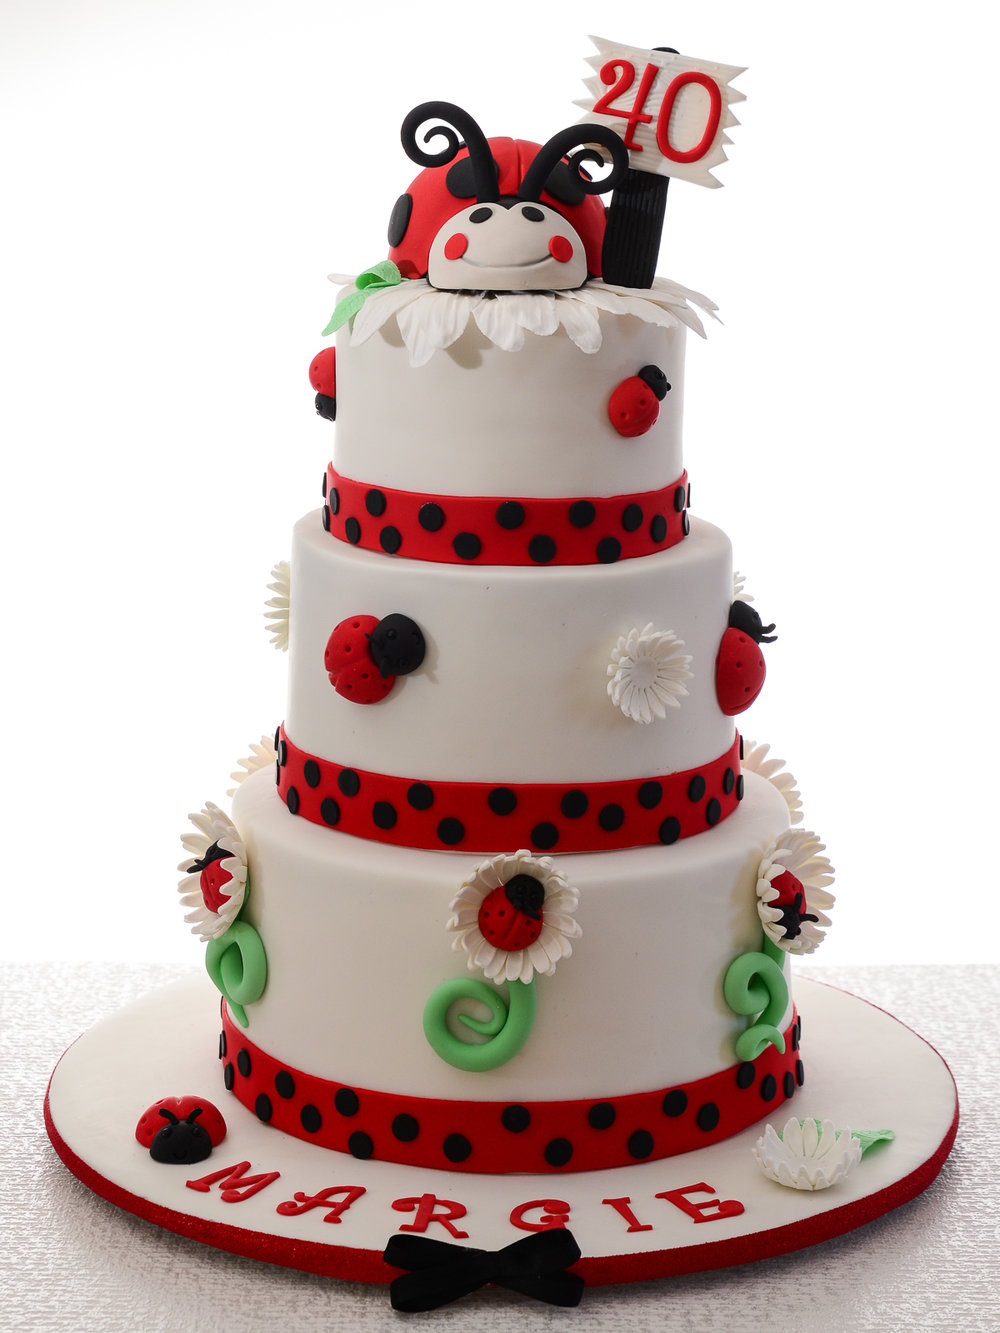 Lady-Beetle-Ladybug-Birthday-Cake.jpg